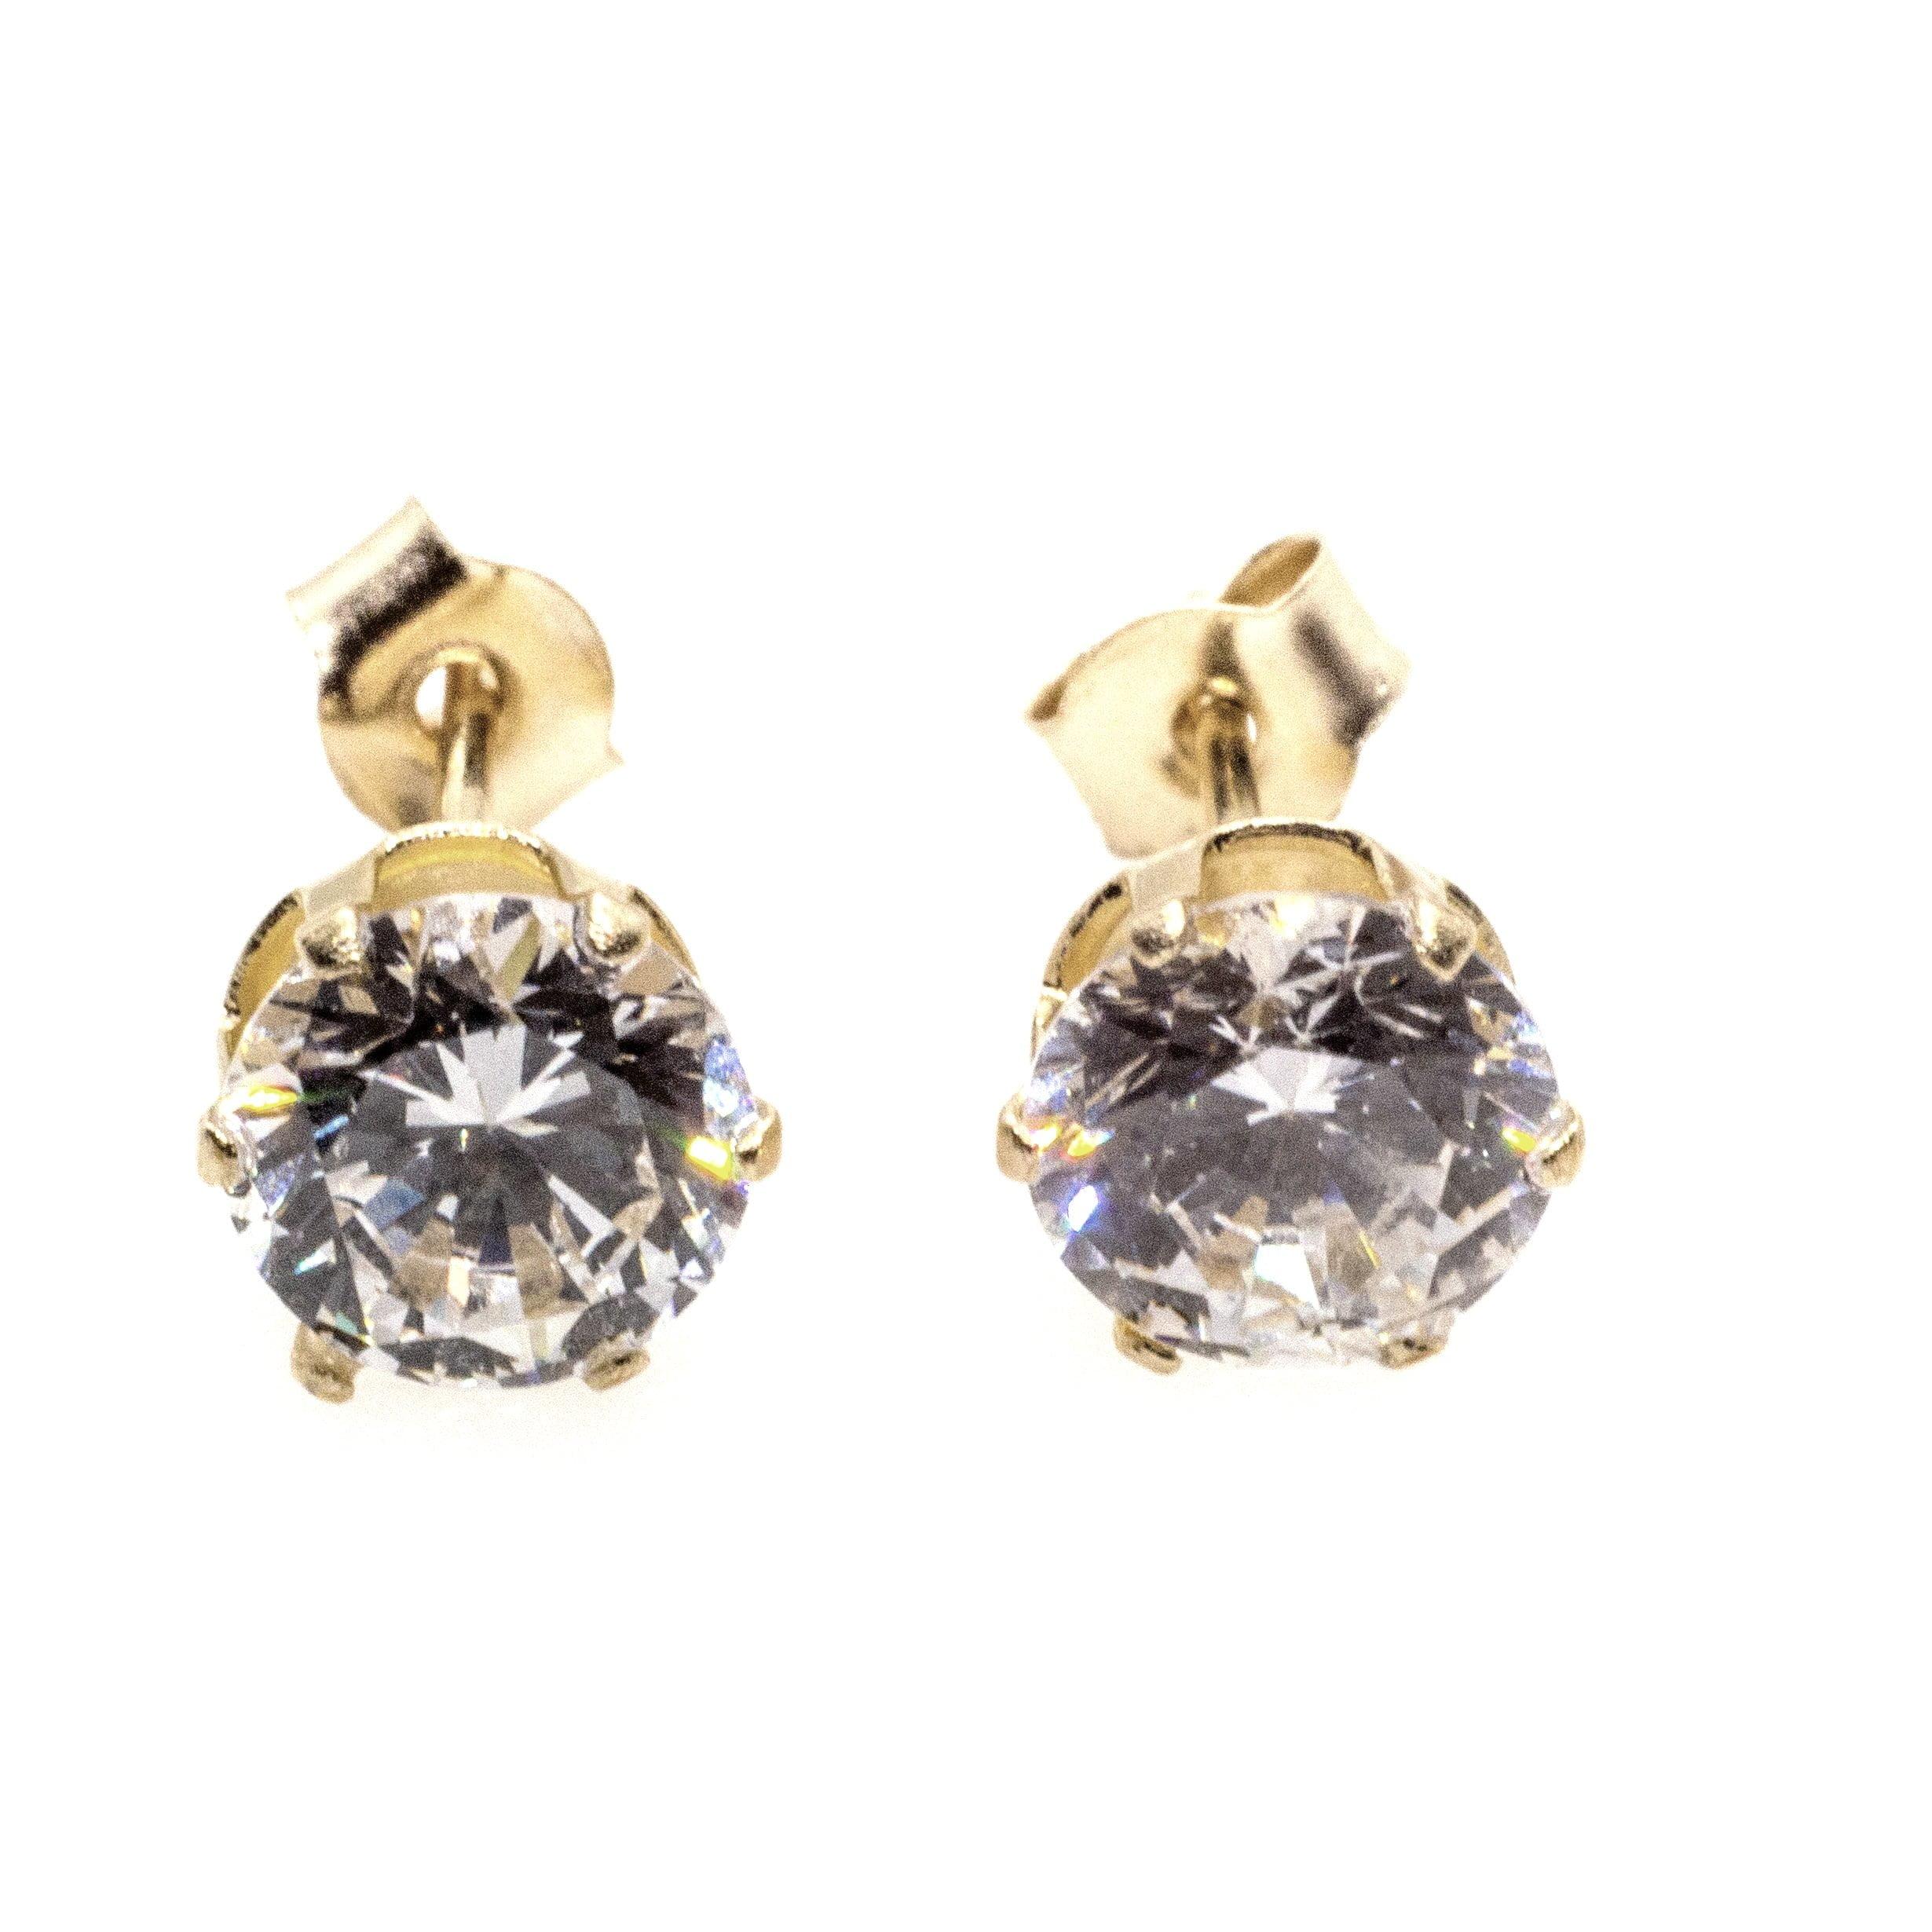 5mm CZ stud earrings 9ct yellow gold alt 2